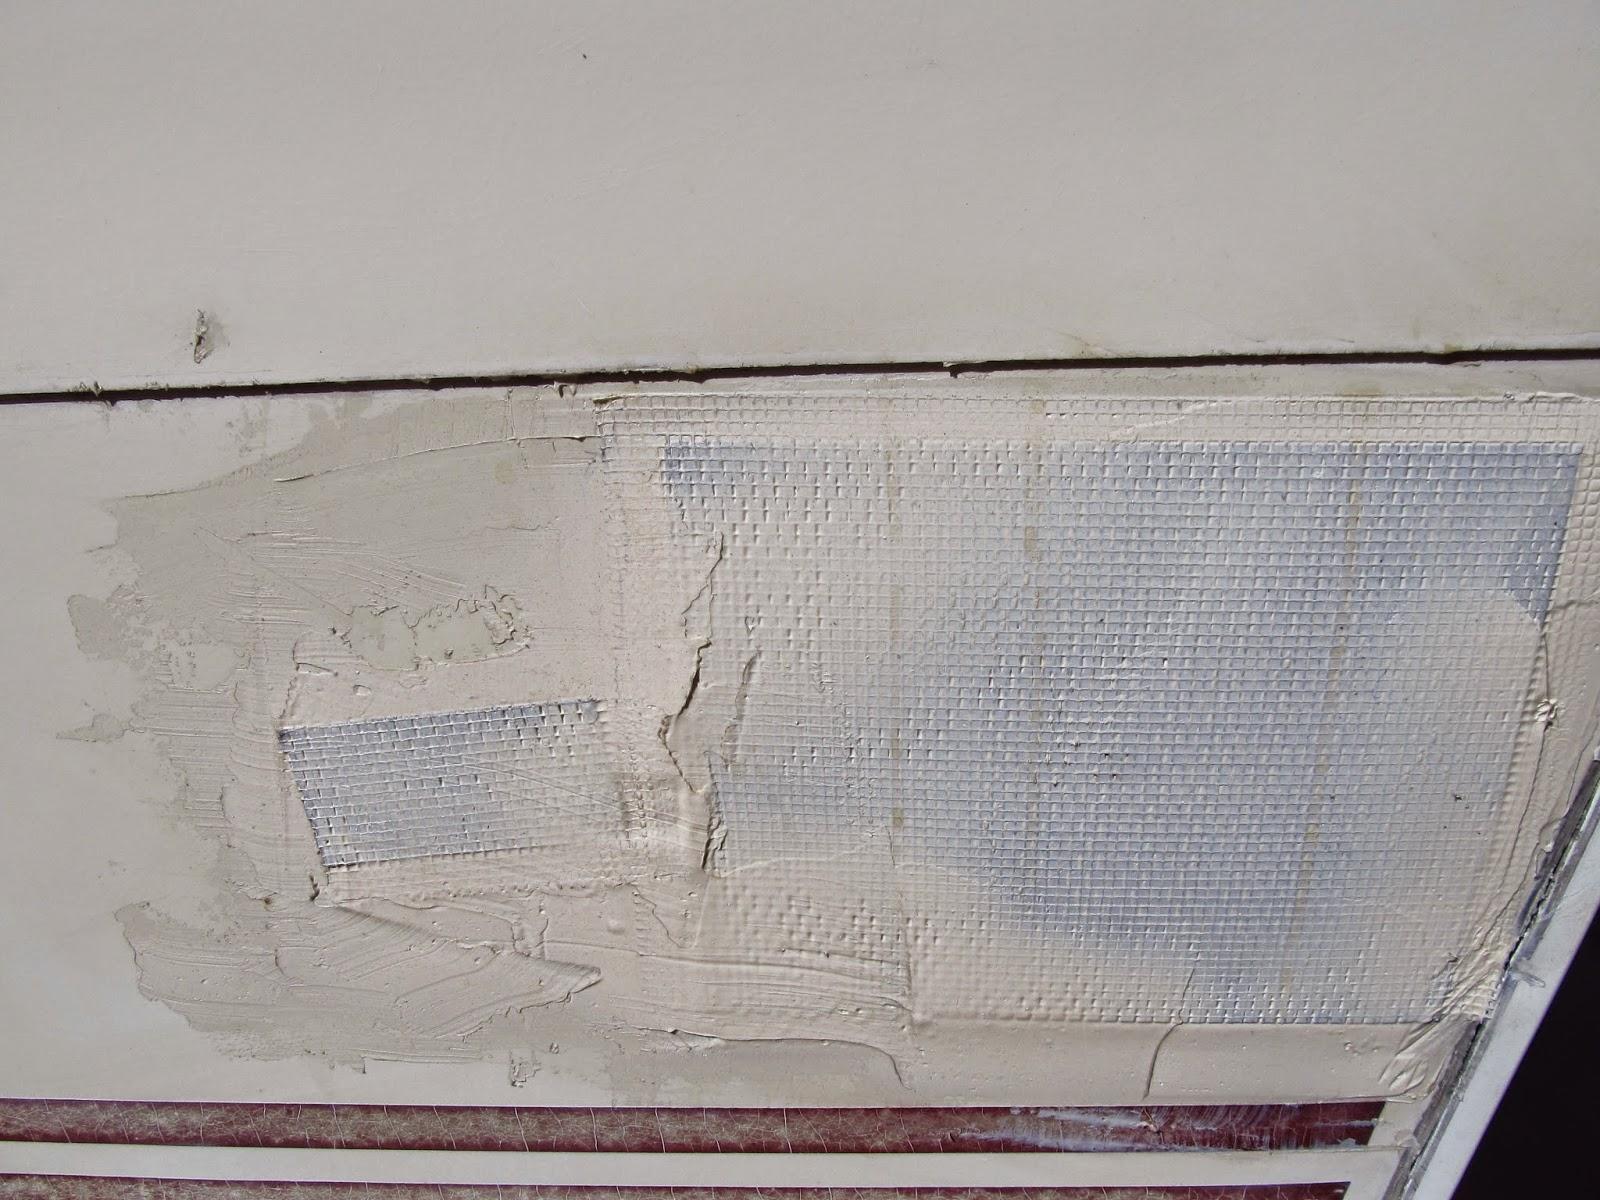 Motor Home Modification Usa Temporary Repair Rv Wall And